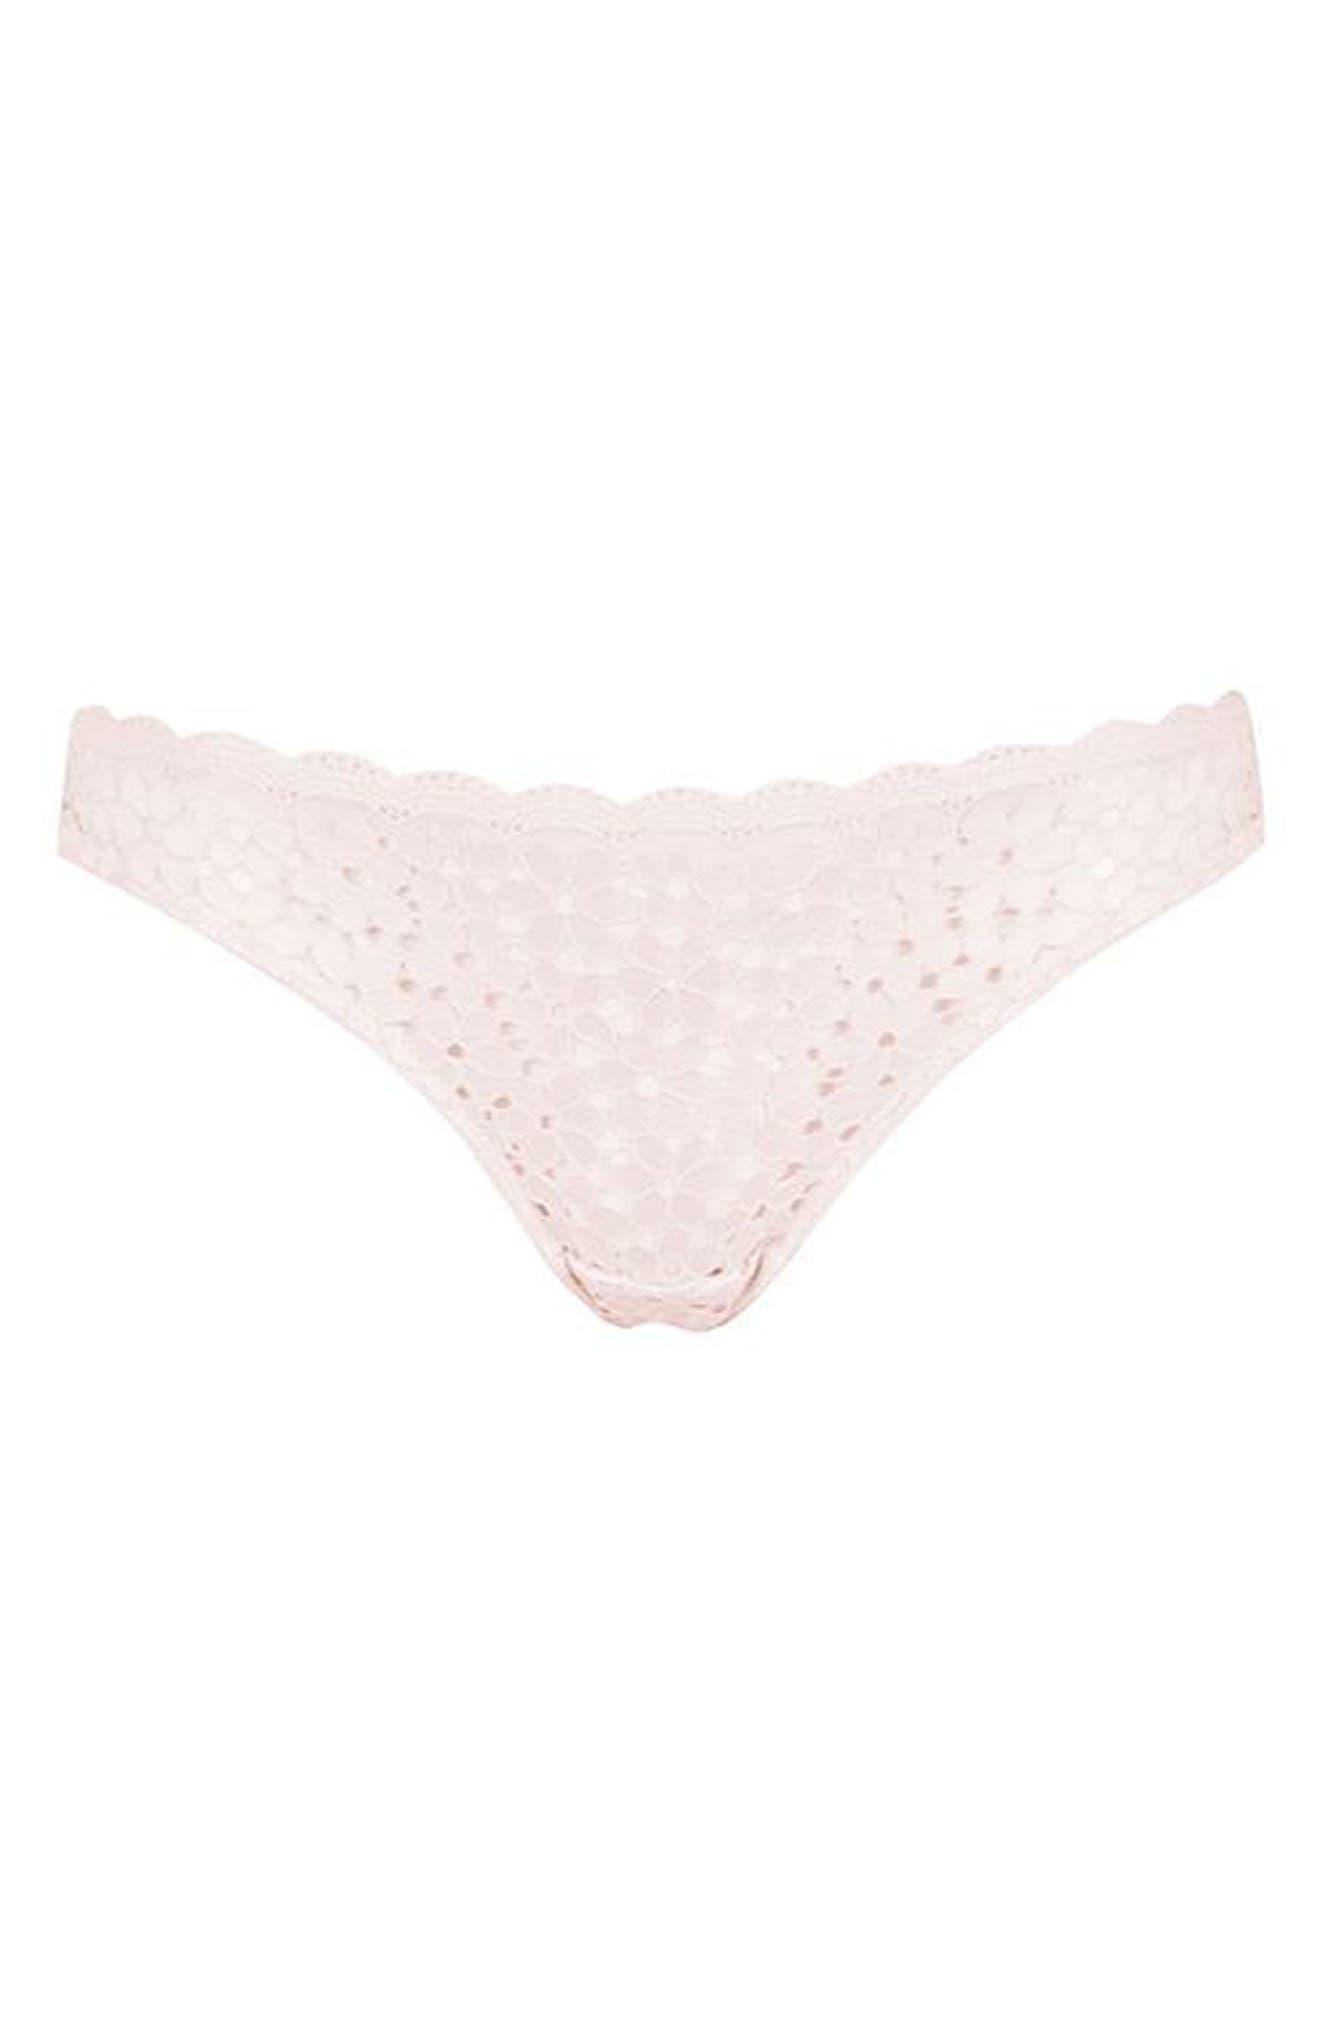 Alternate Image 3  - Topshop Summer Haze Lace Thong